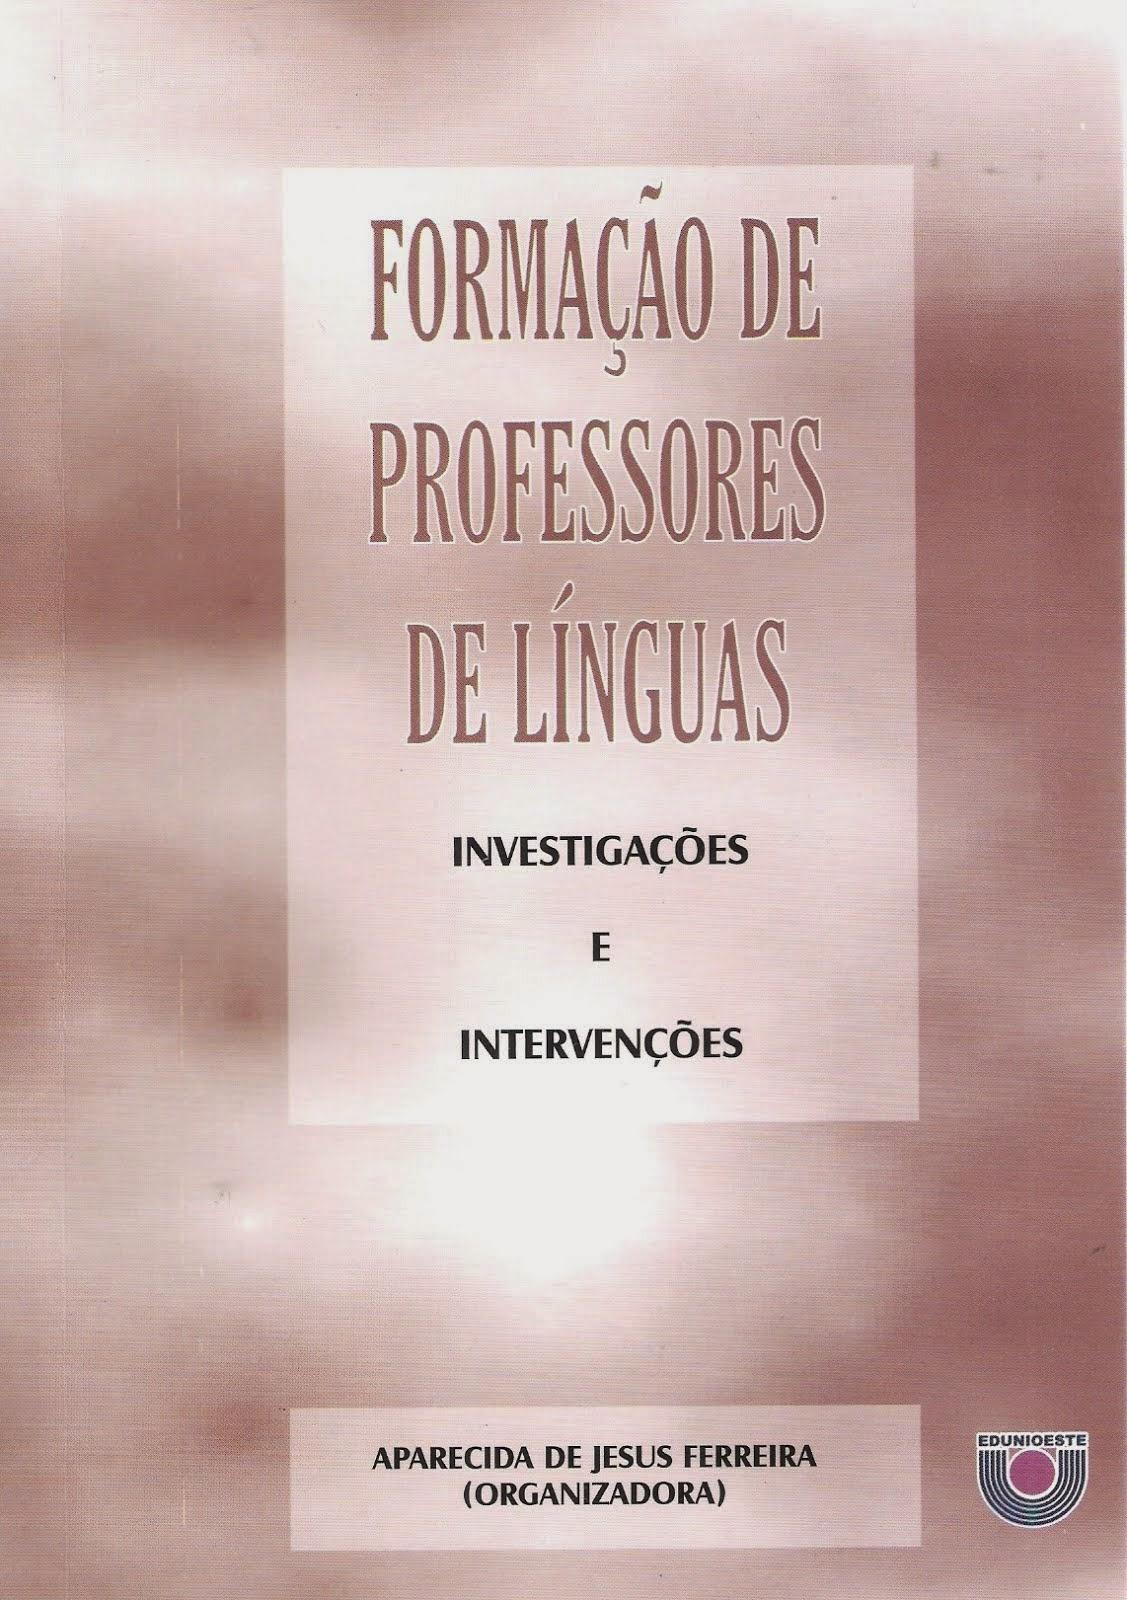 Professores de Línguas